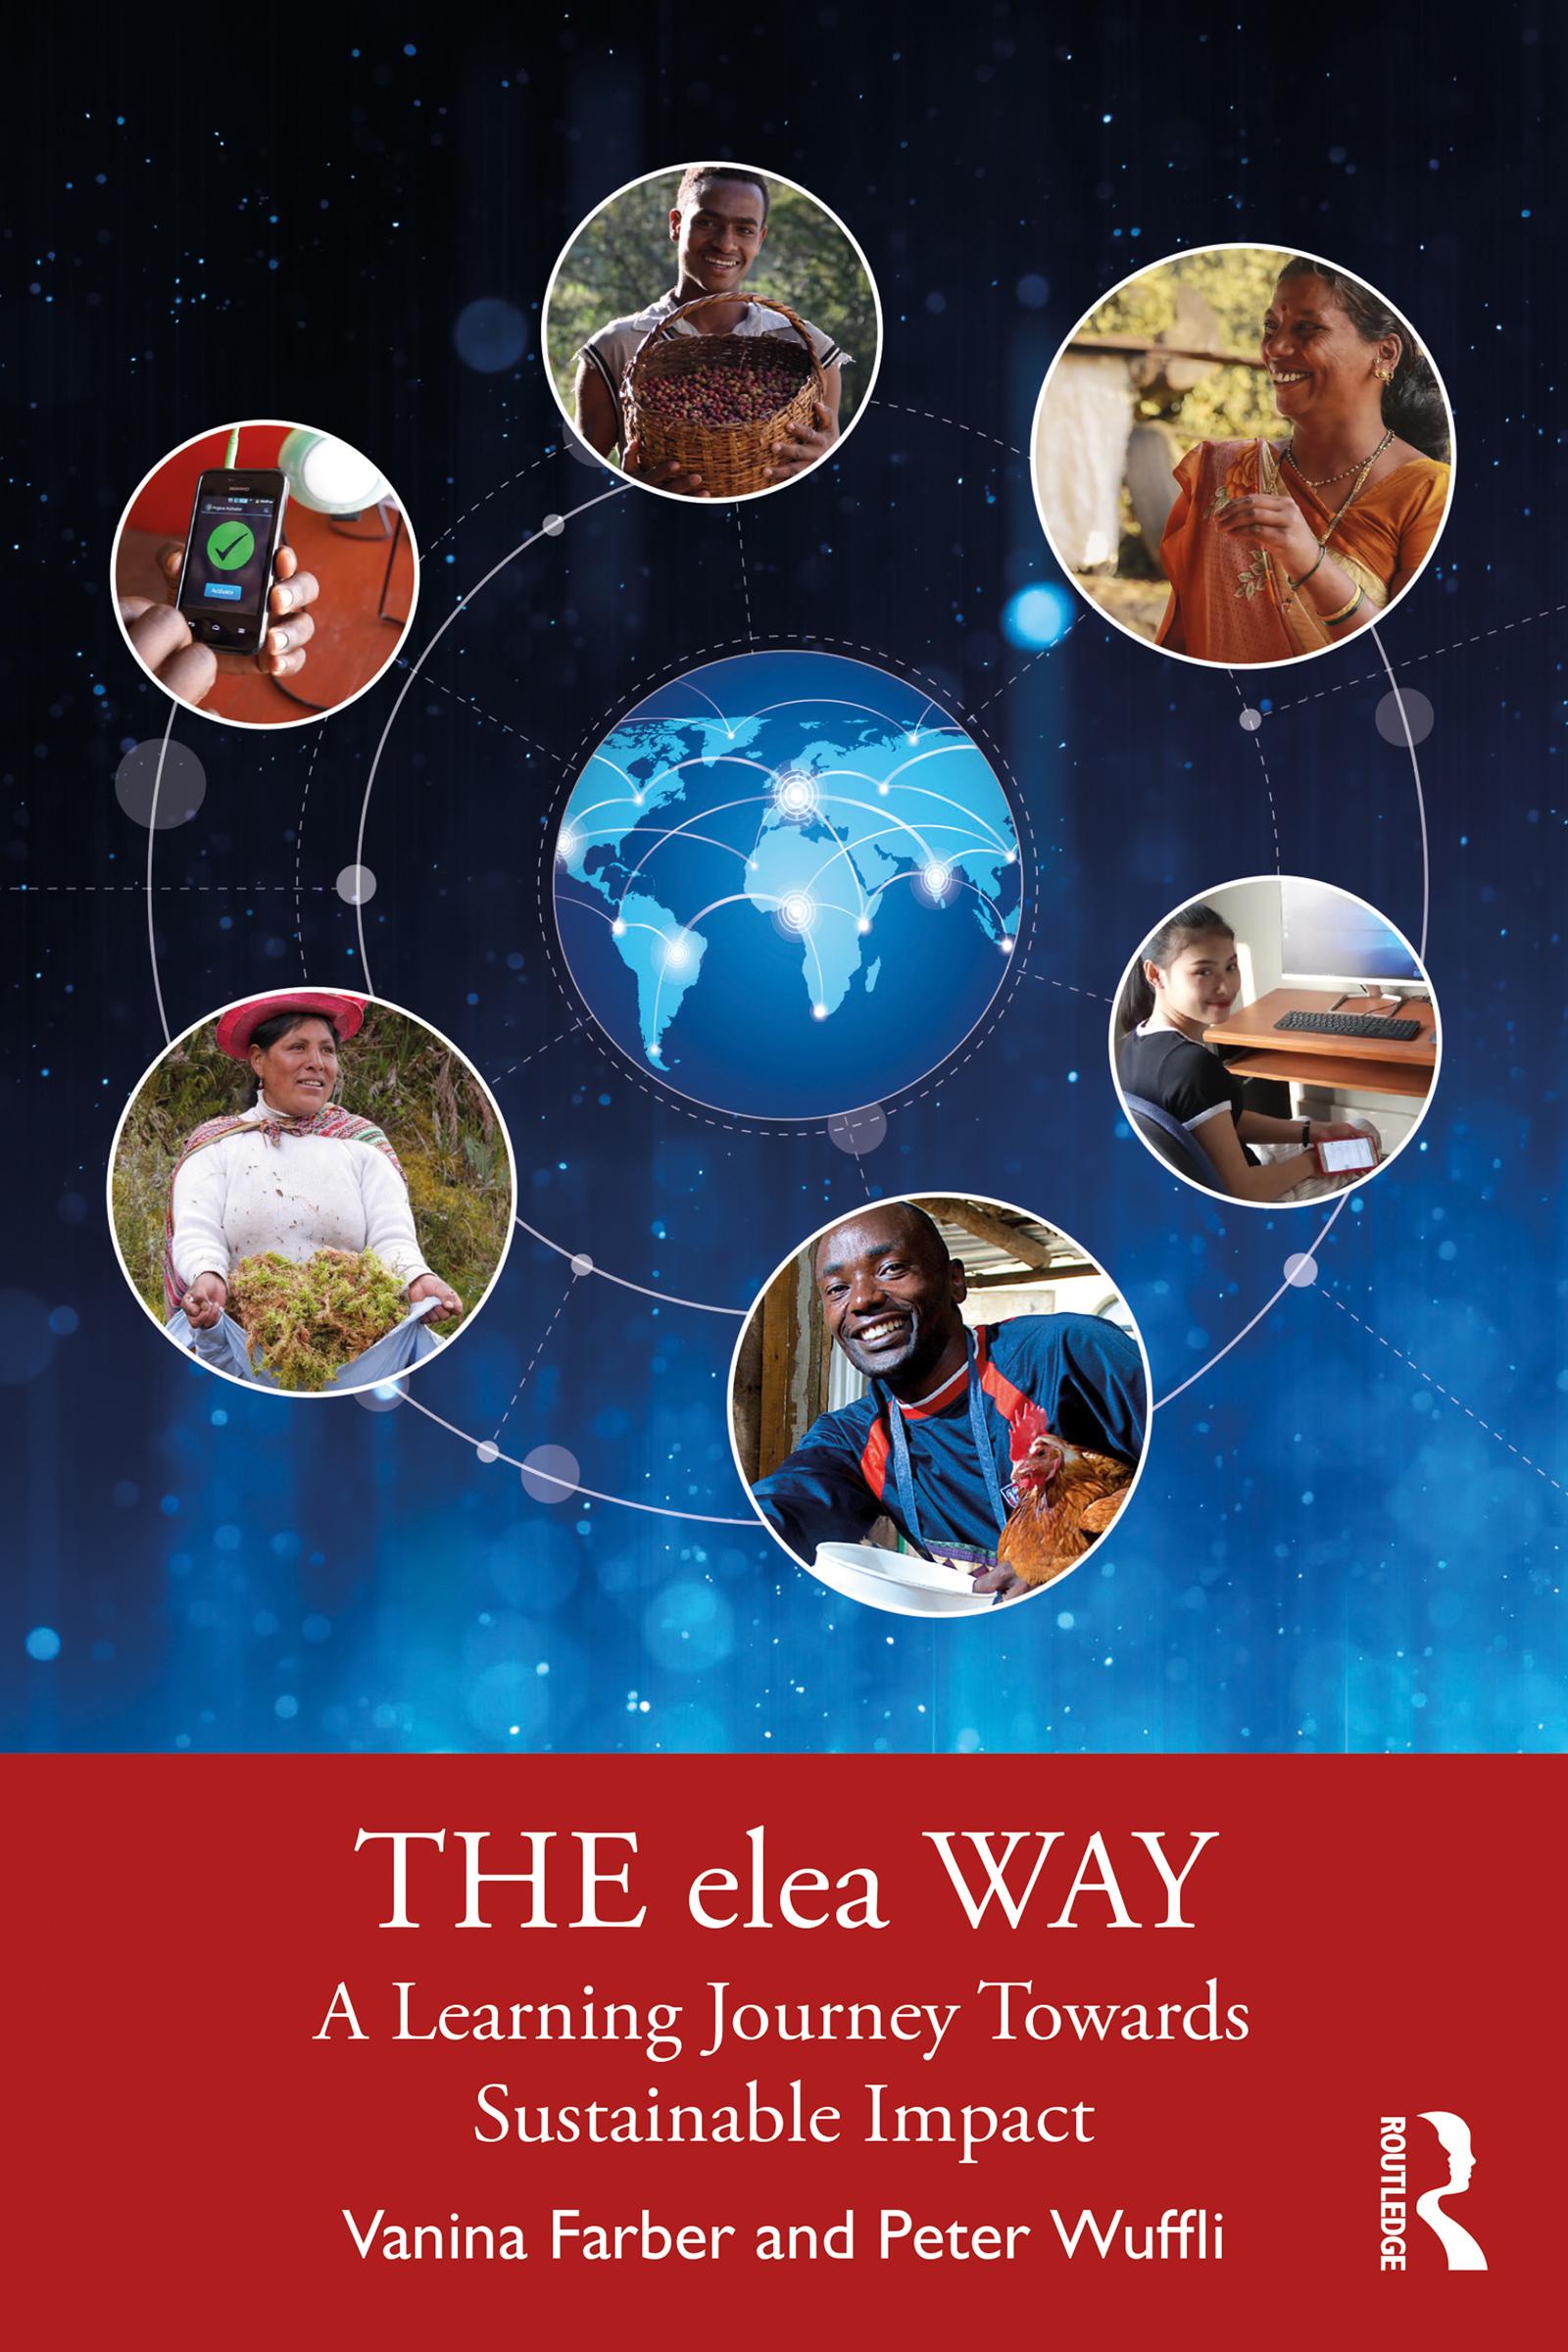 THE elea WAY